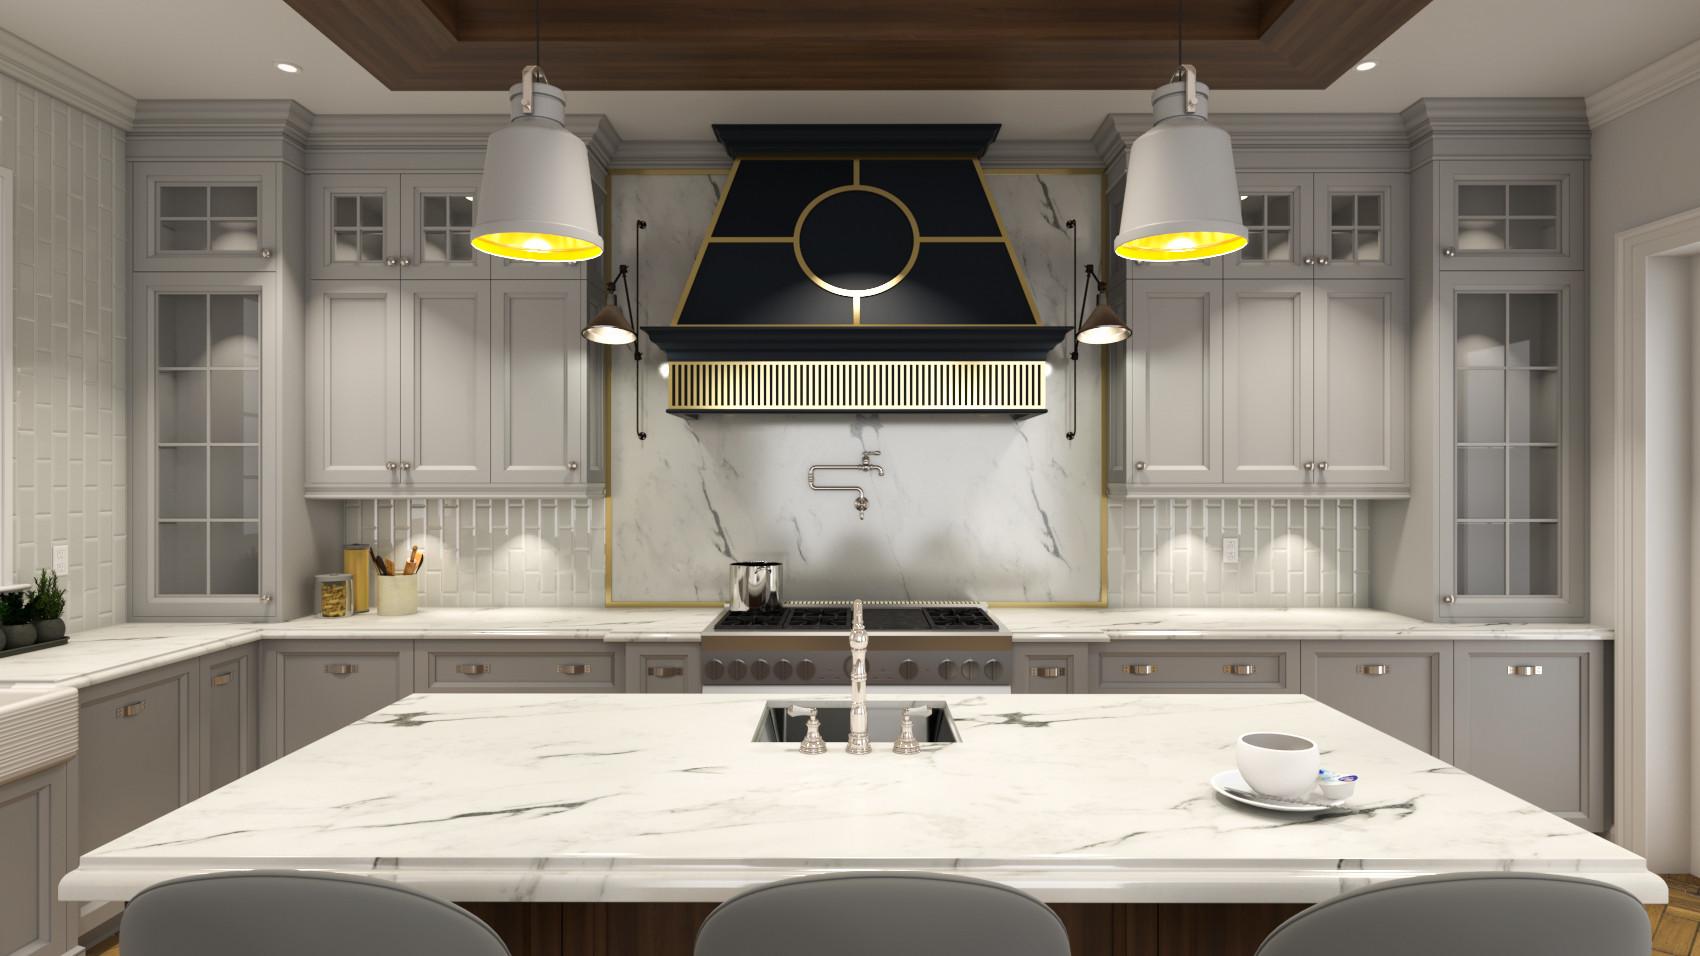 tradional kitchen